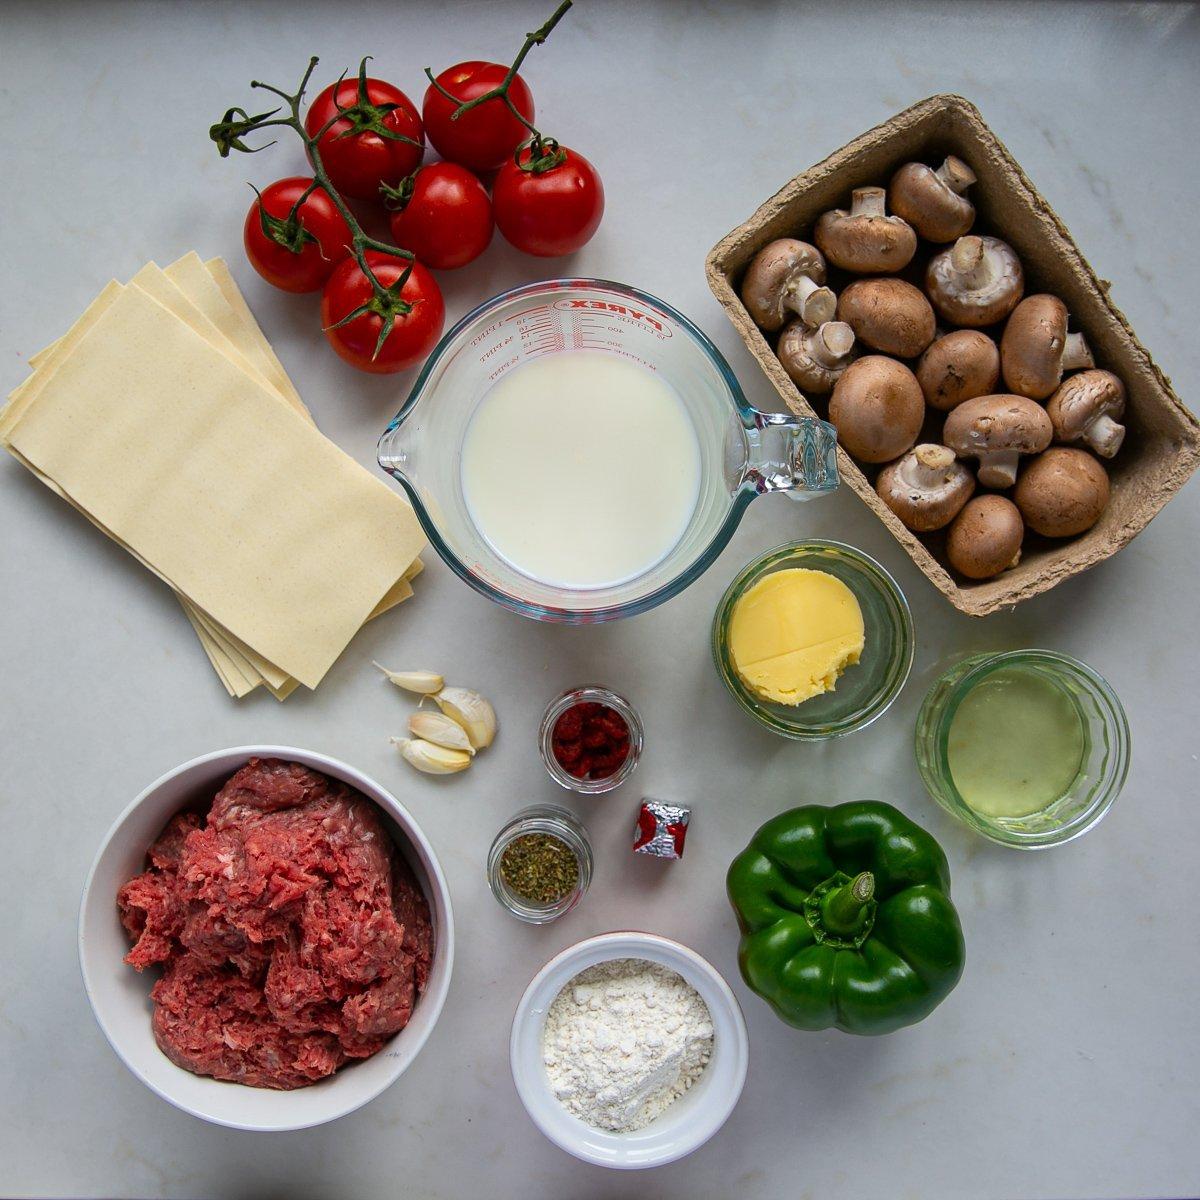 Ingredients for homemade lasagne